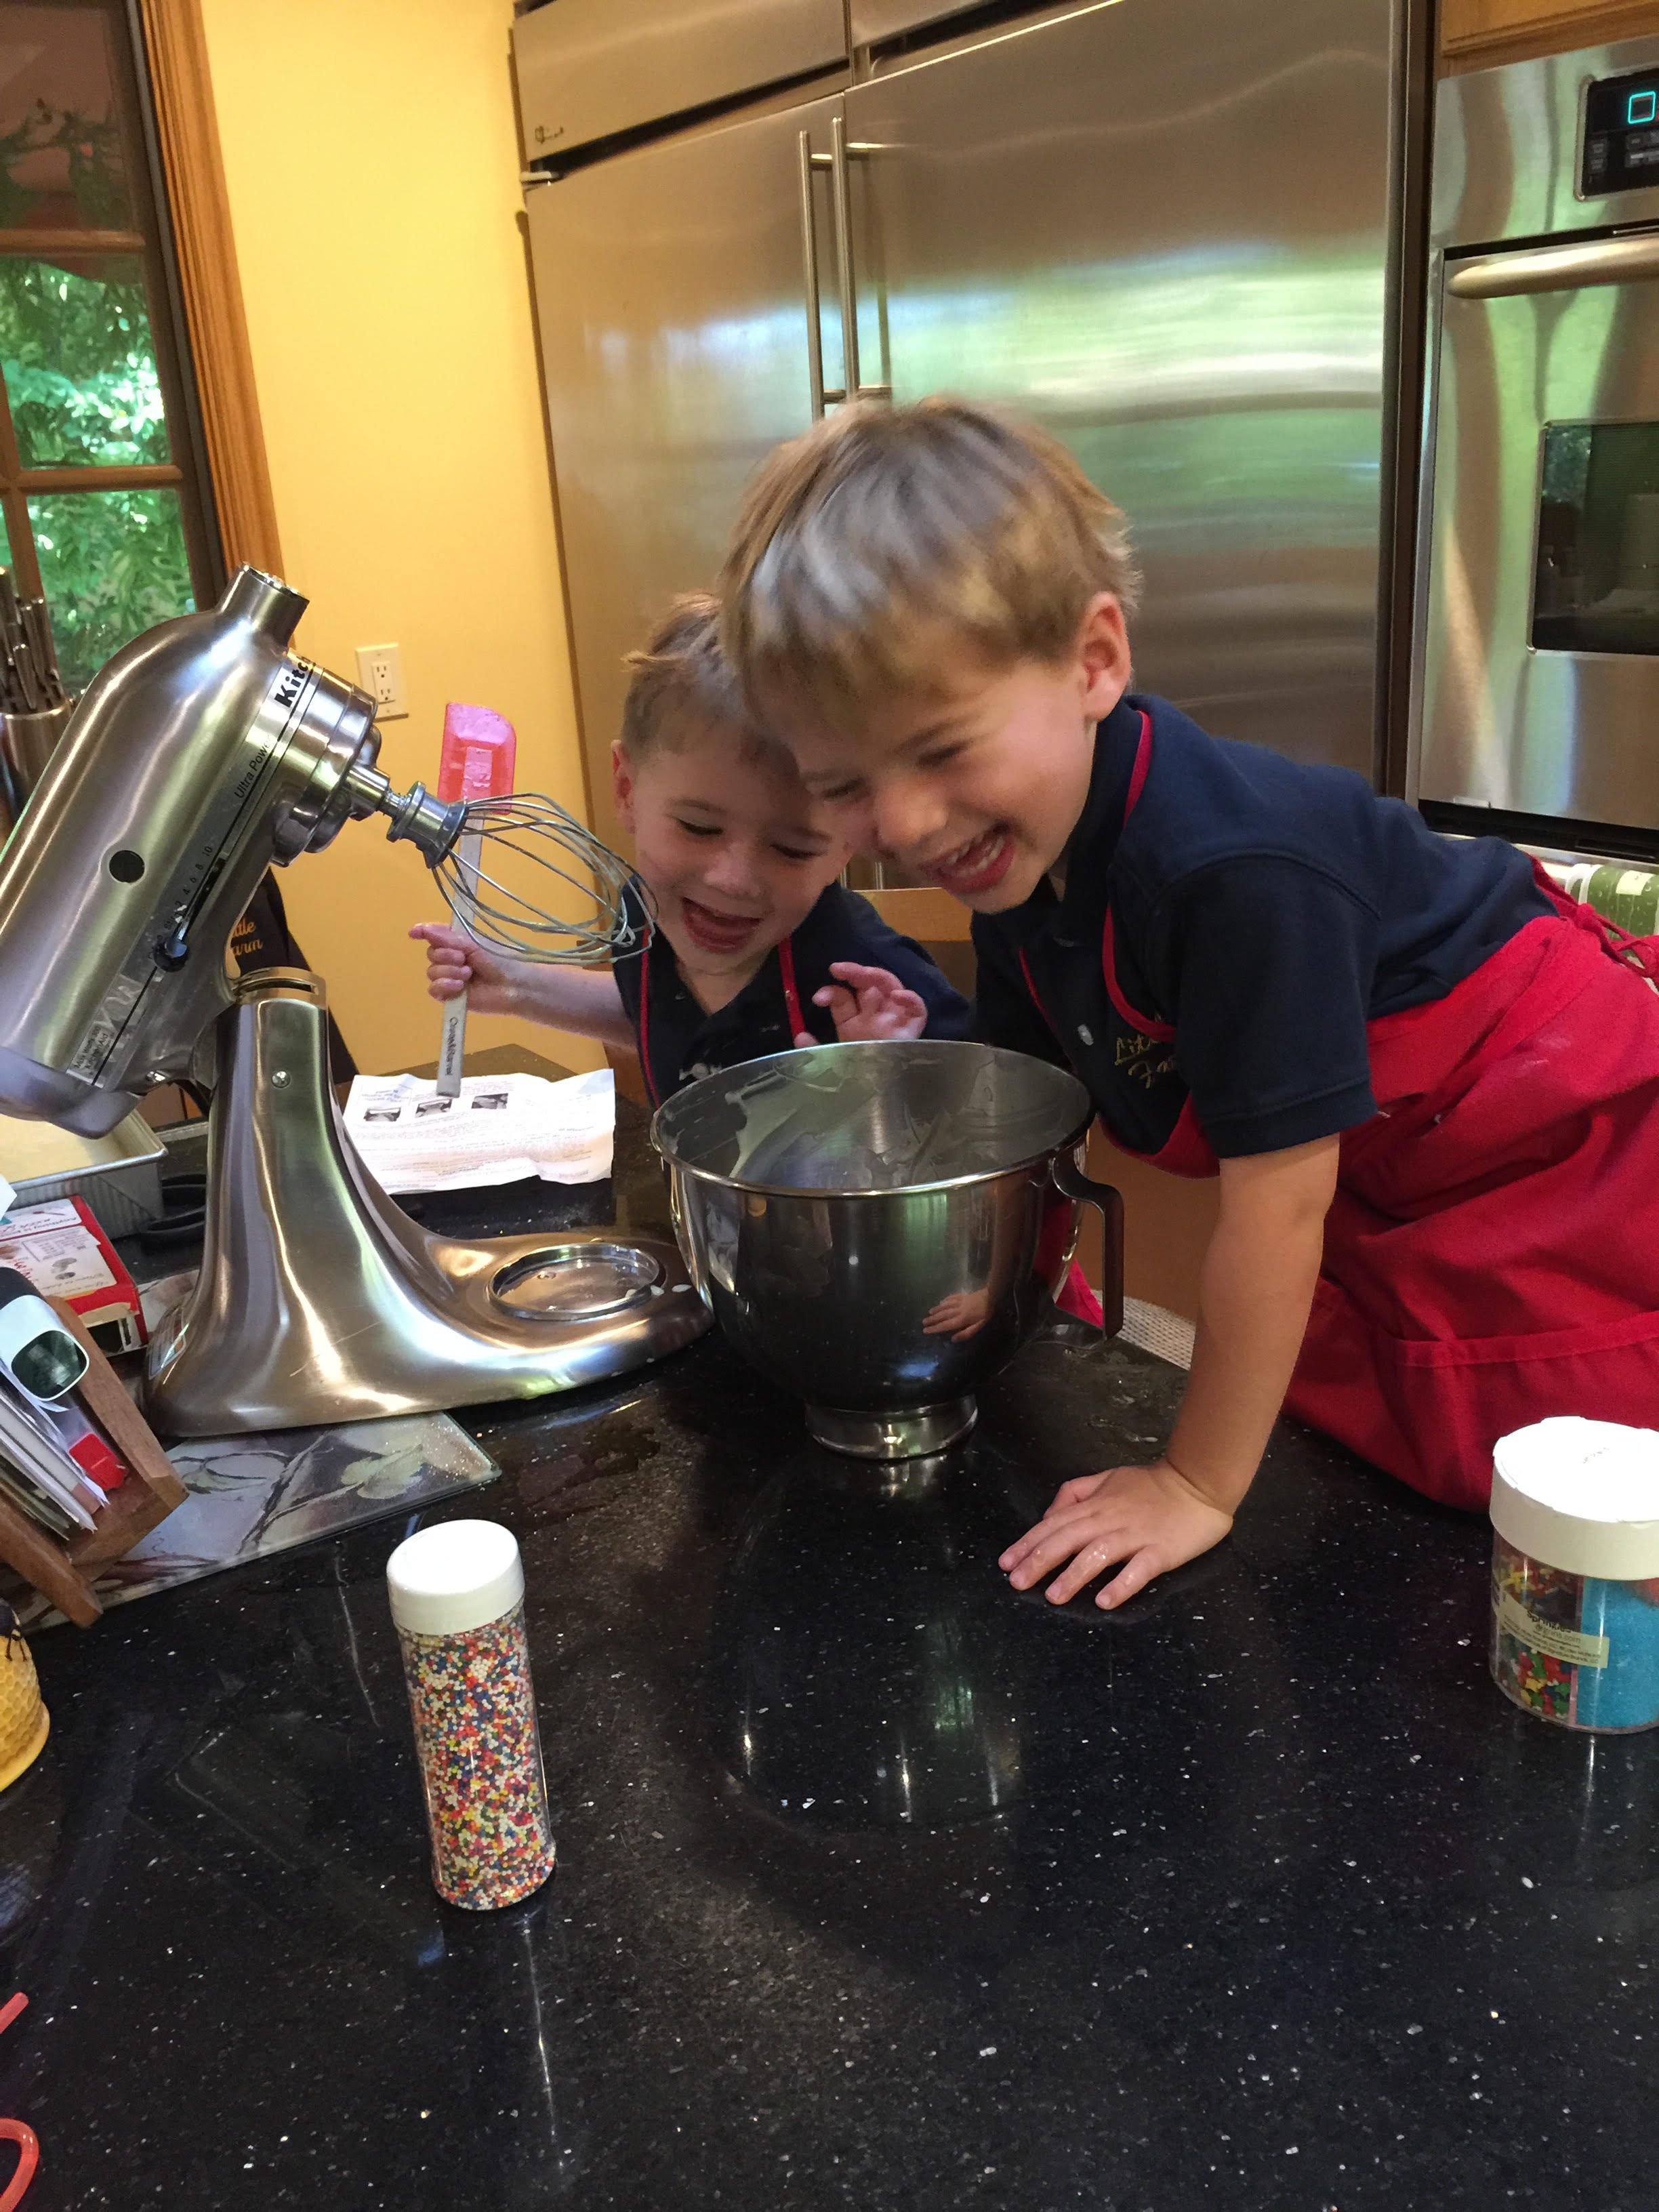 NOah and Gabe making a cake